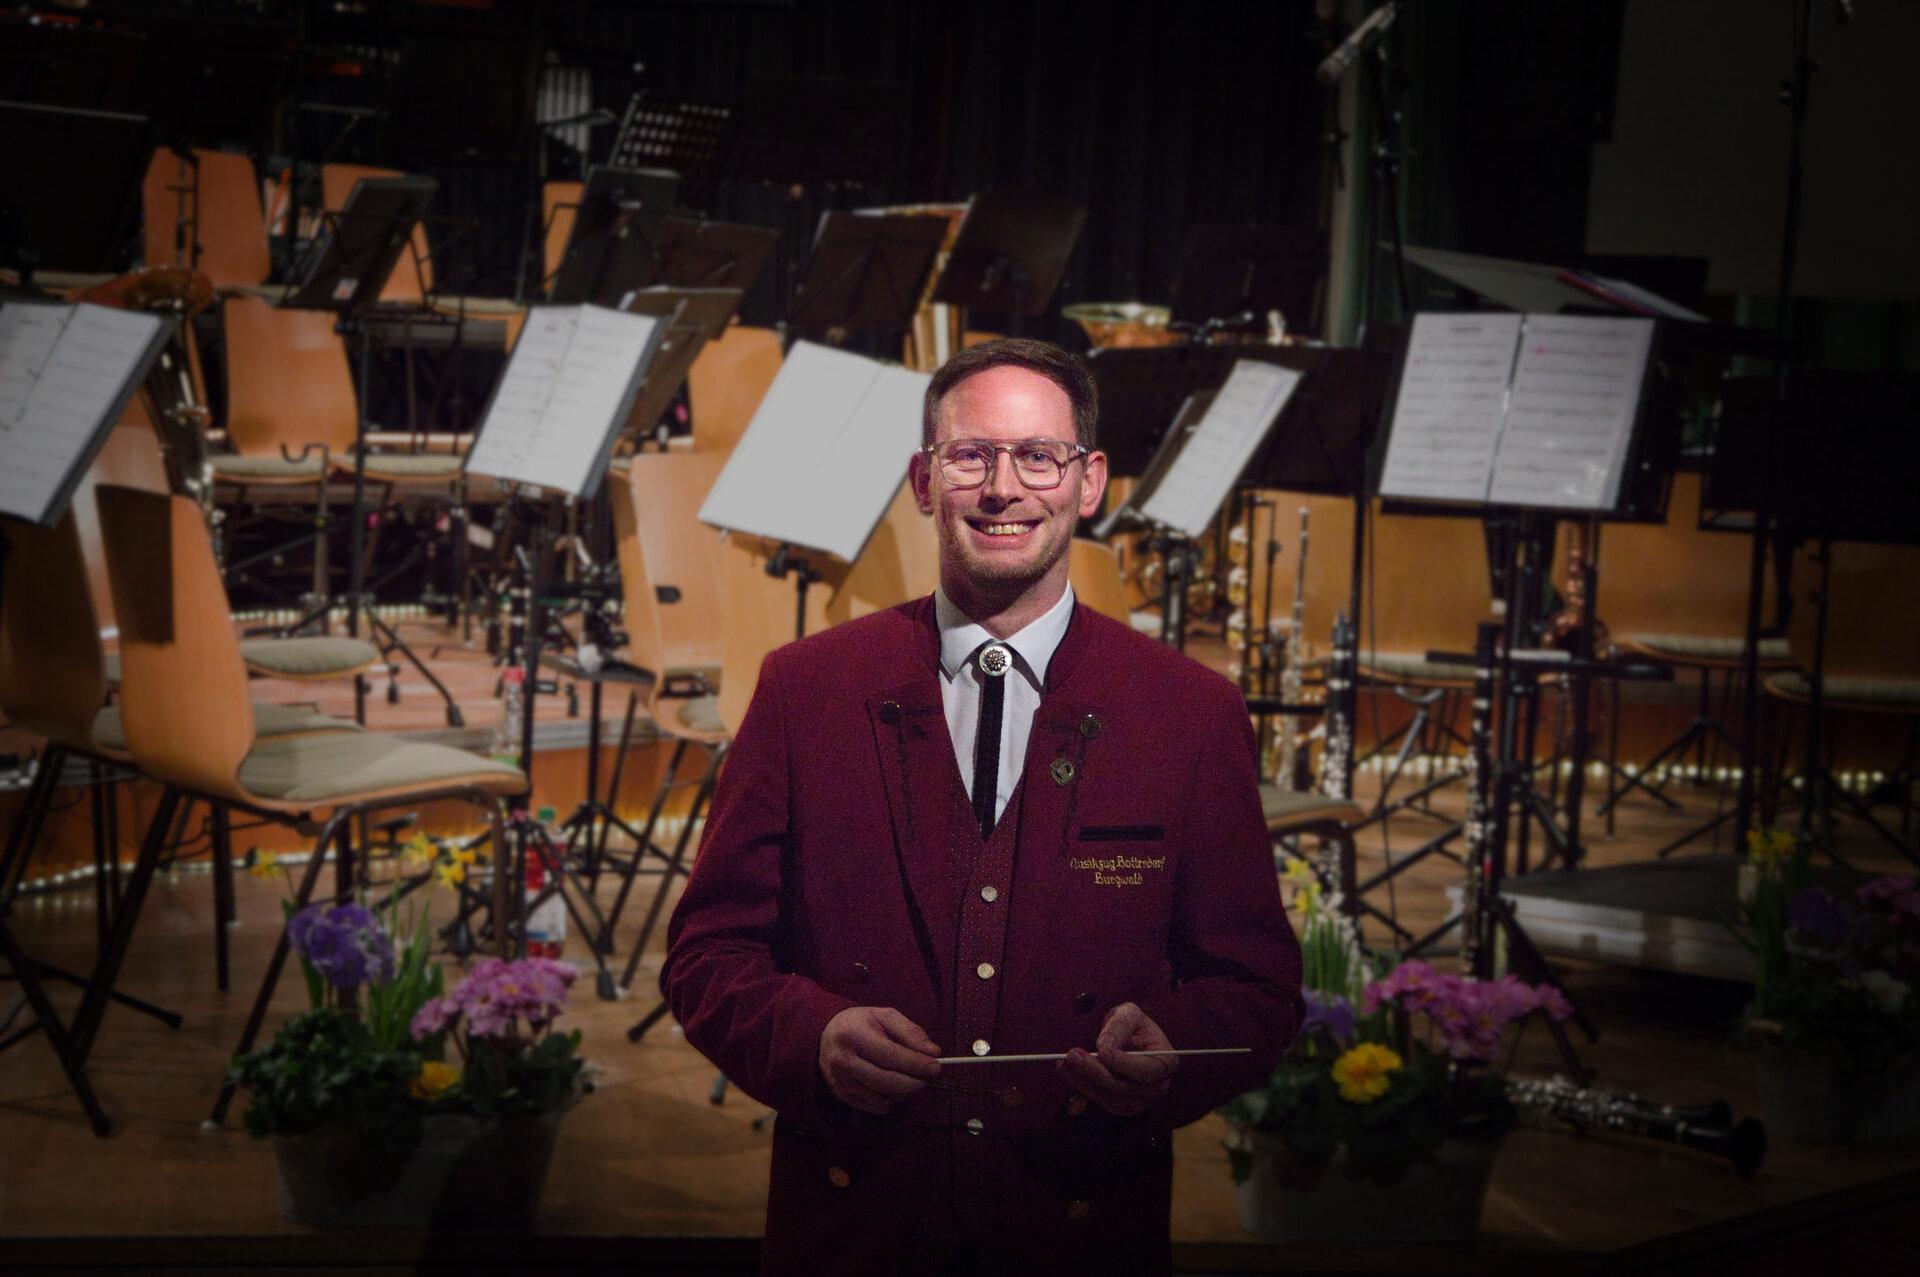 MZB2020-Dirigent01